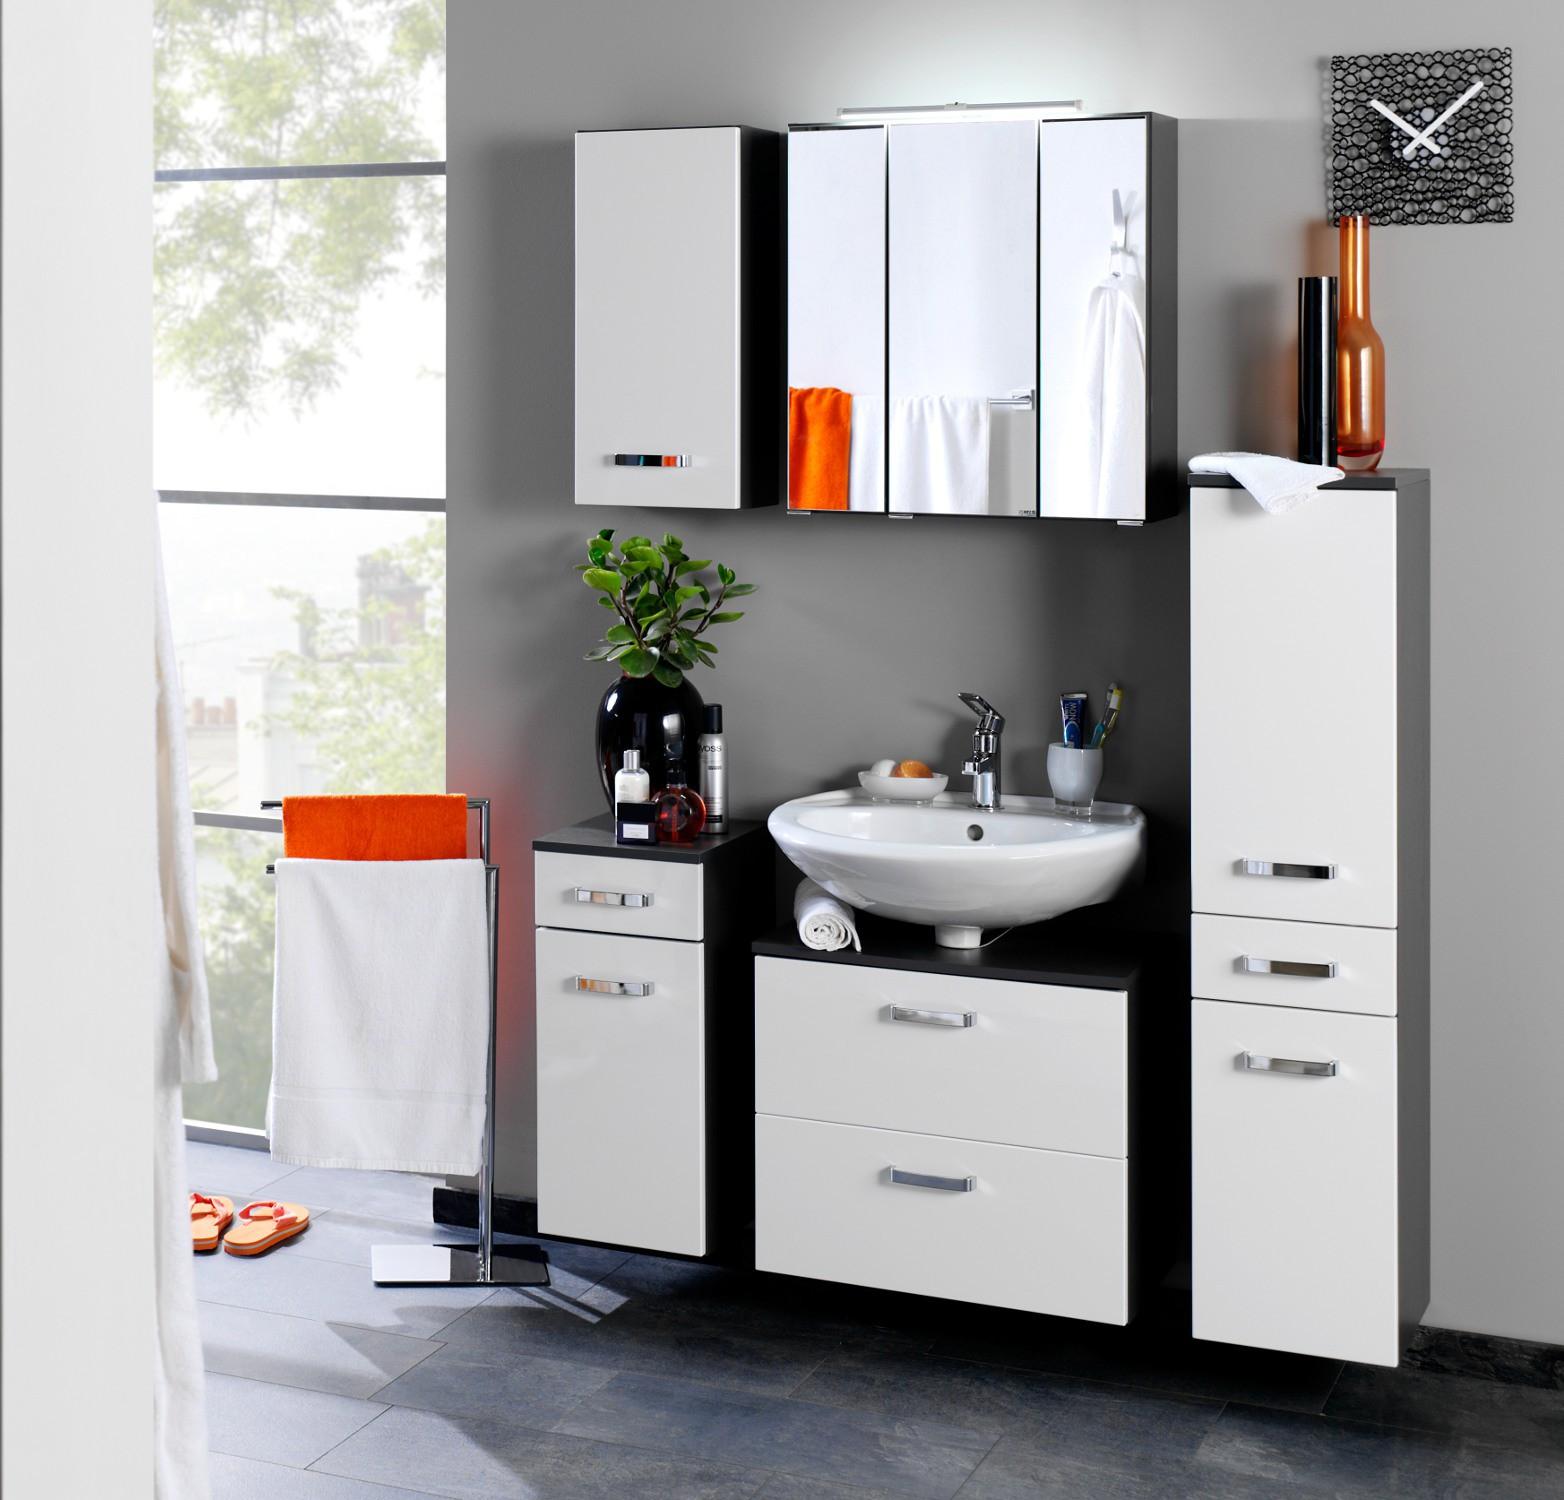 bad spiegelschrank bologna 3 t rig mit led aufbauleuchte 70 cm breit graphitgrau bad. Black Bedroom Furniture Sets. Home Design Ideas